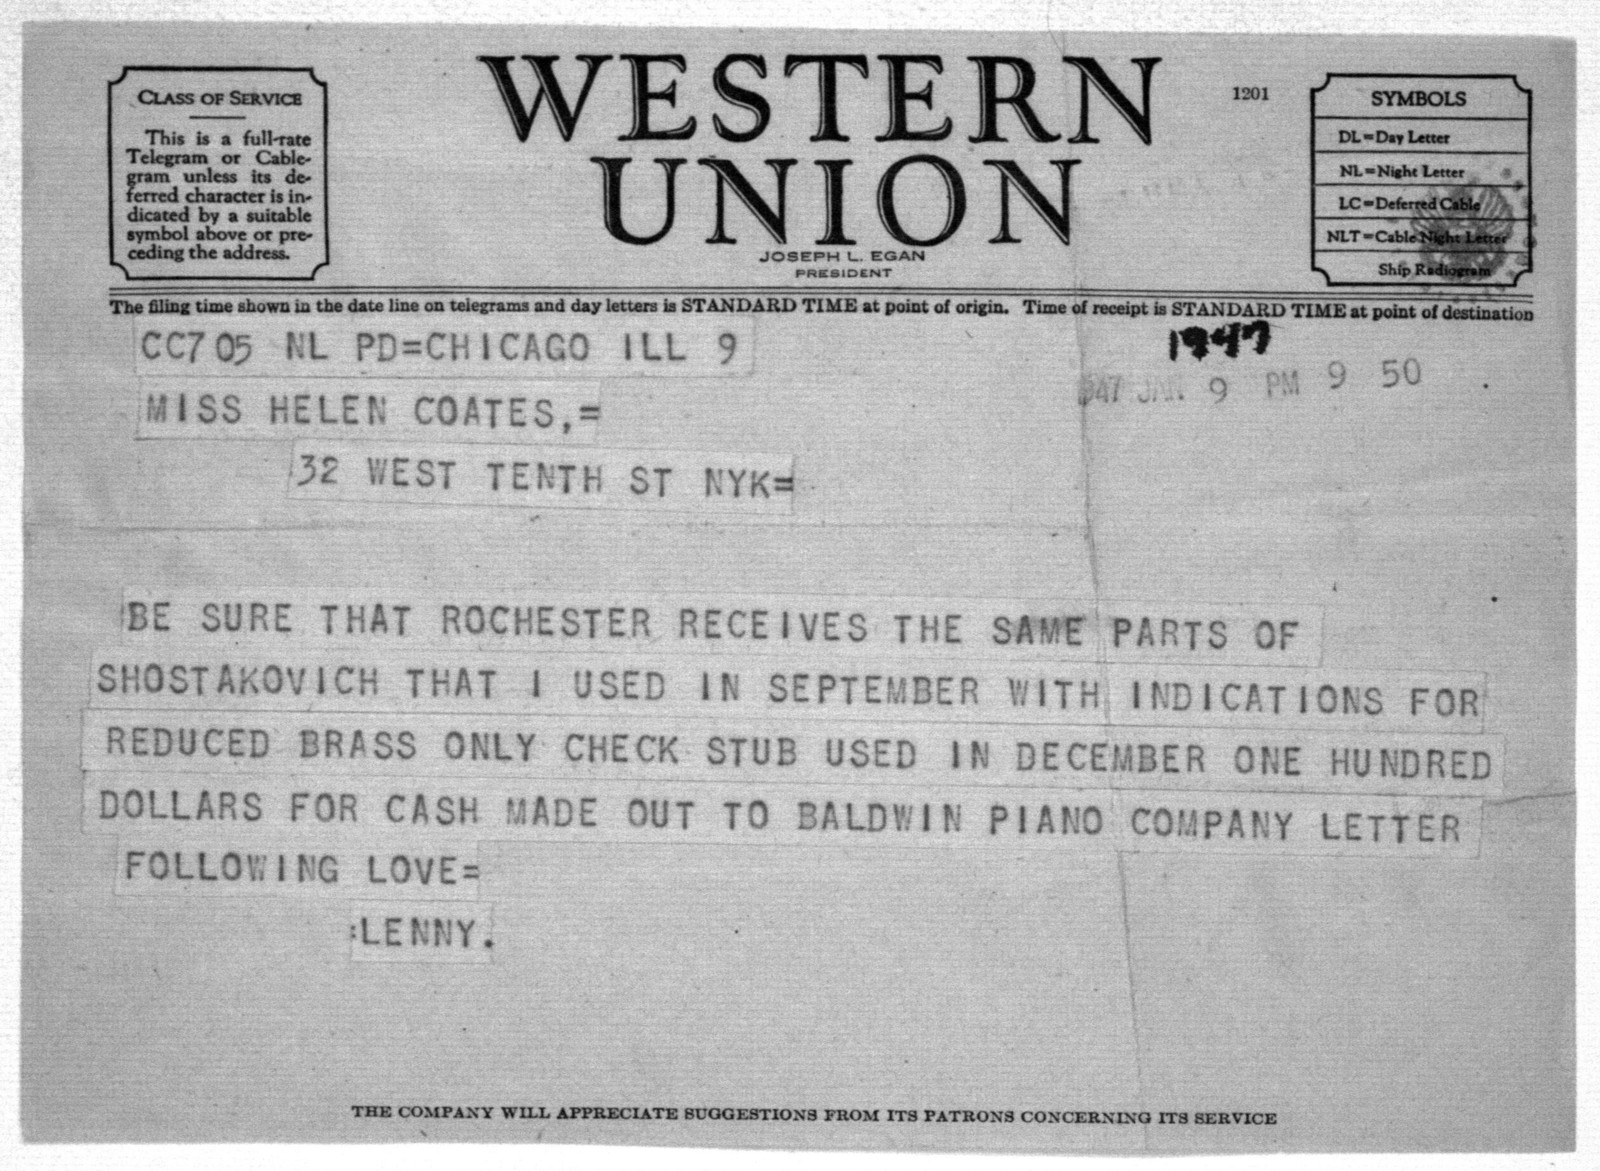 Letter from Leonard Bernstein to Helen Coates, January 9, 1947